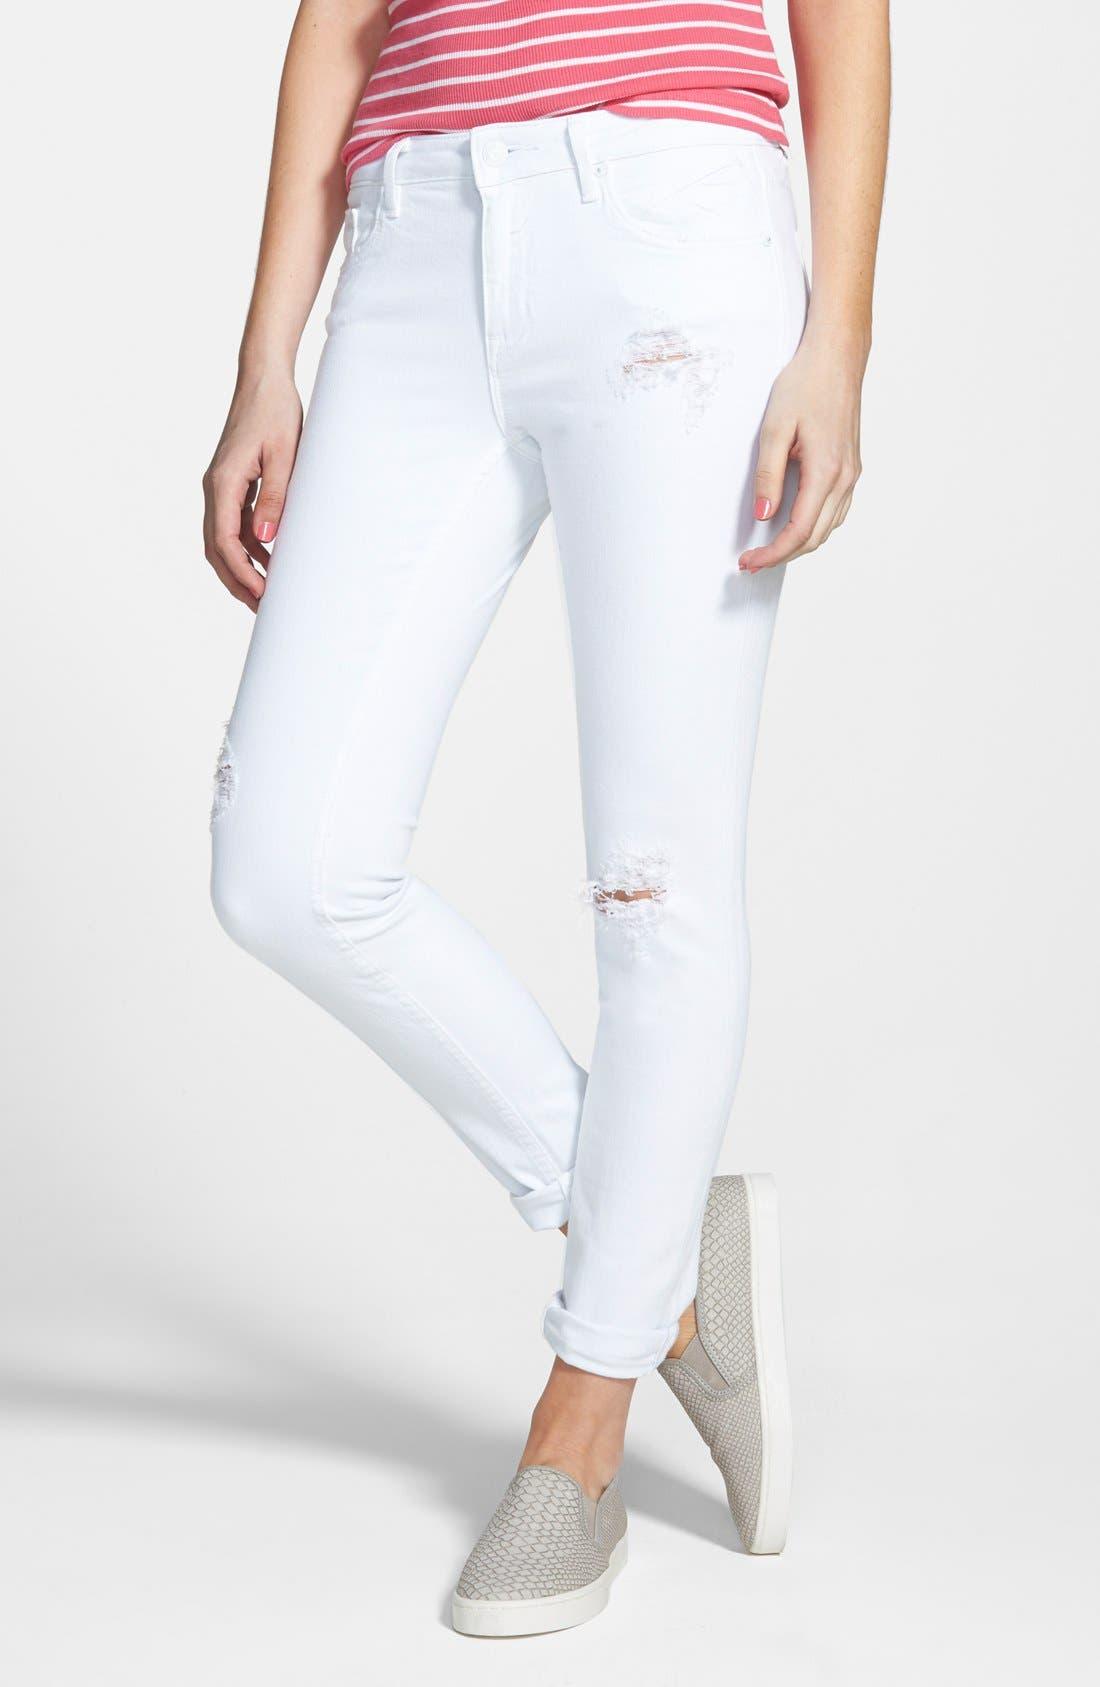 Alternate Image 1 Selected - Vigoss 'Tomboy' Destroyed Crop Skinny Jeans (White)